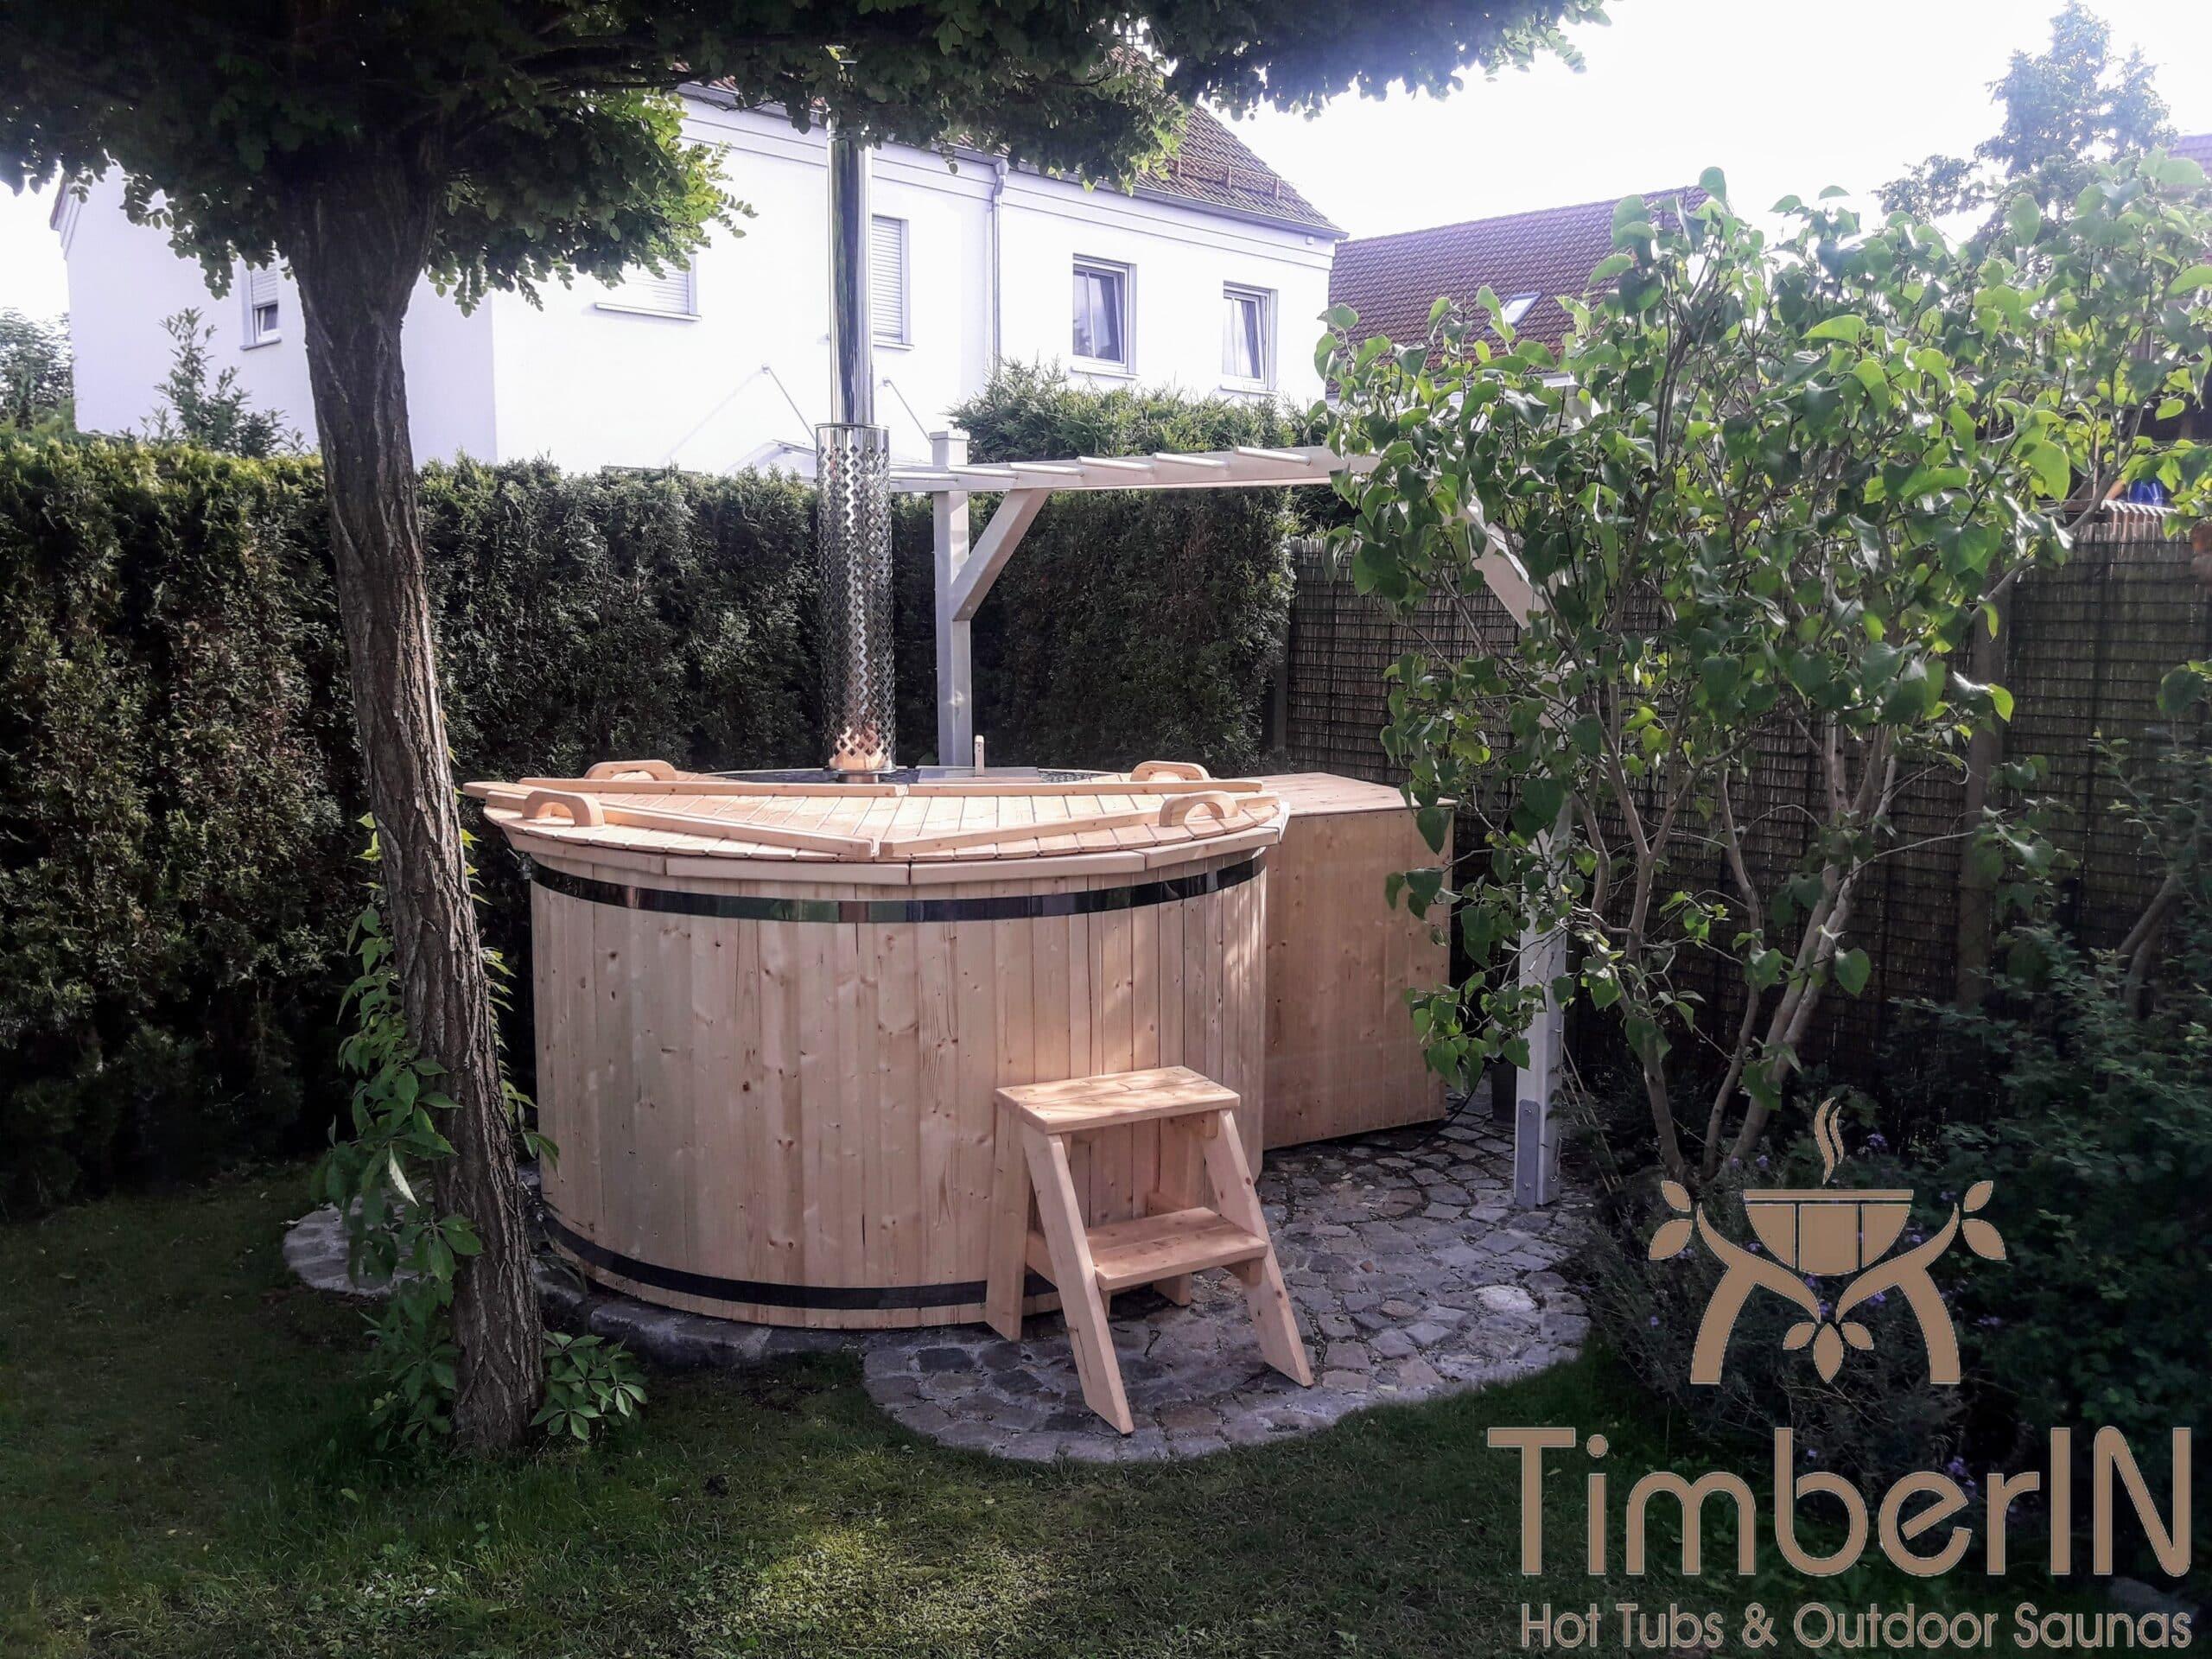 Badezuber aus Holz mit Holzofen Deluxe 1 scaled